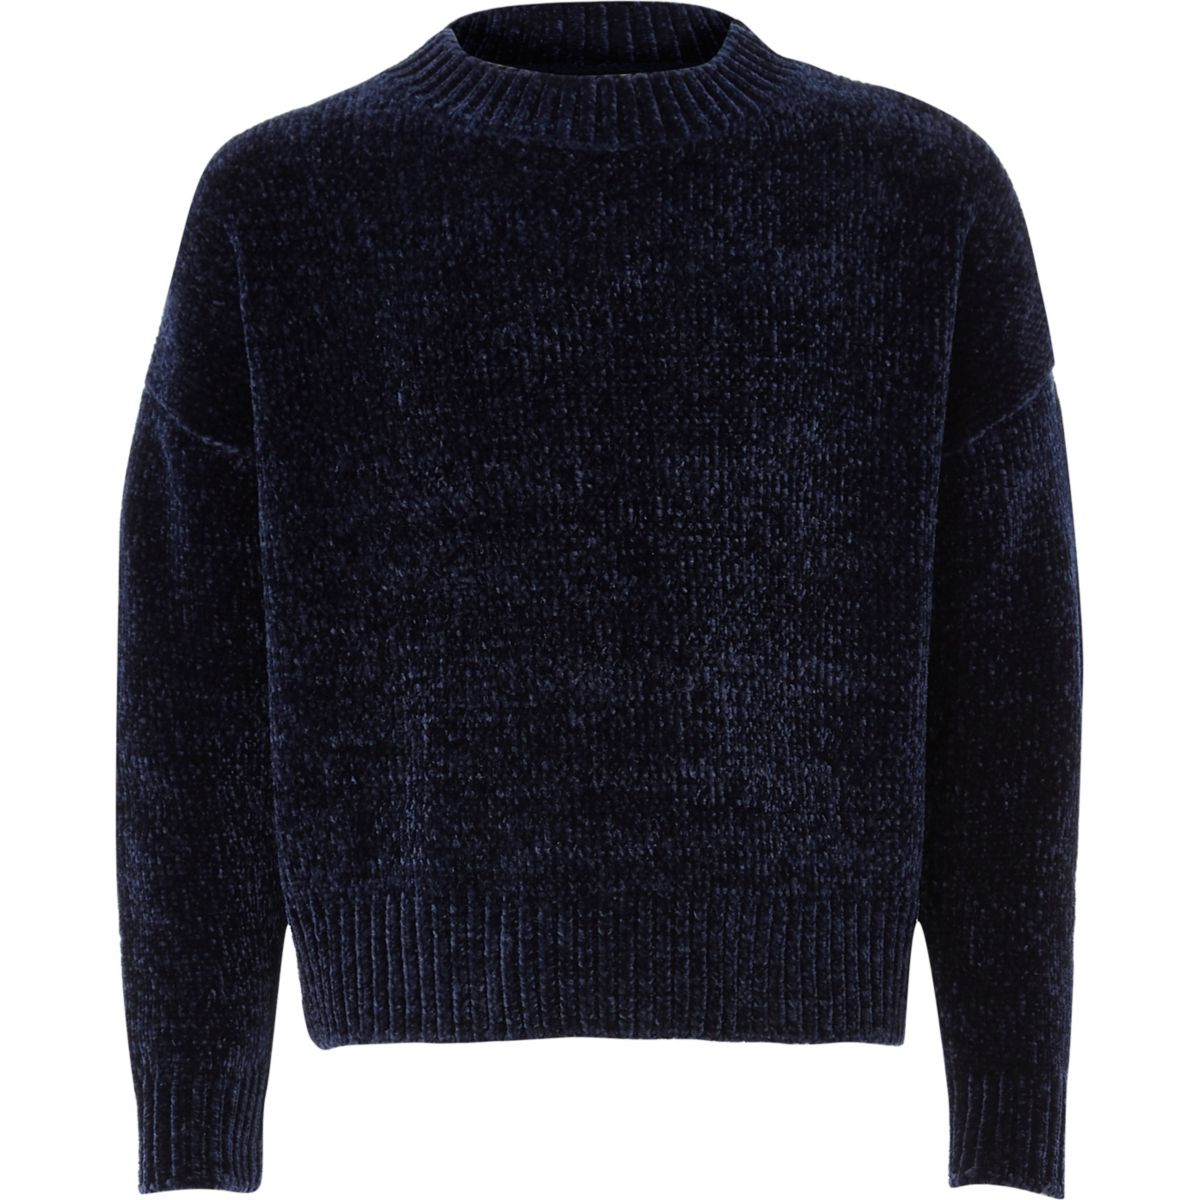 Girls navy chenille sweater